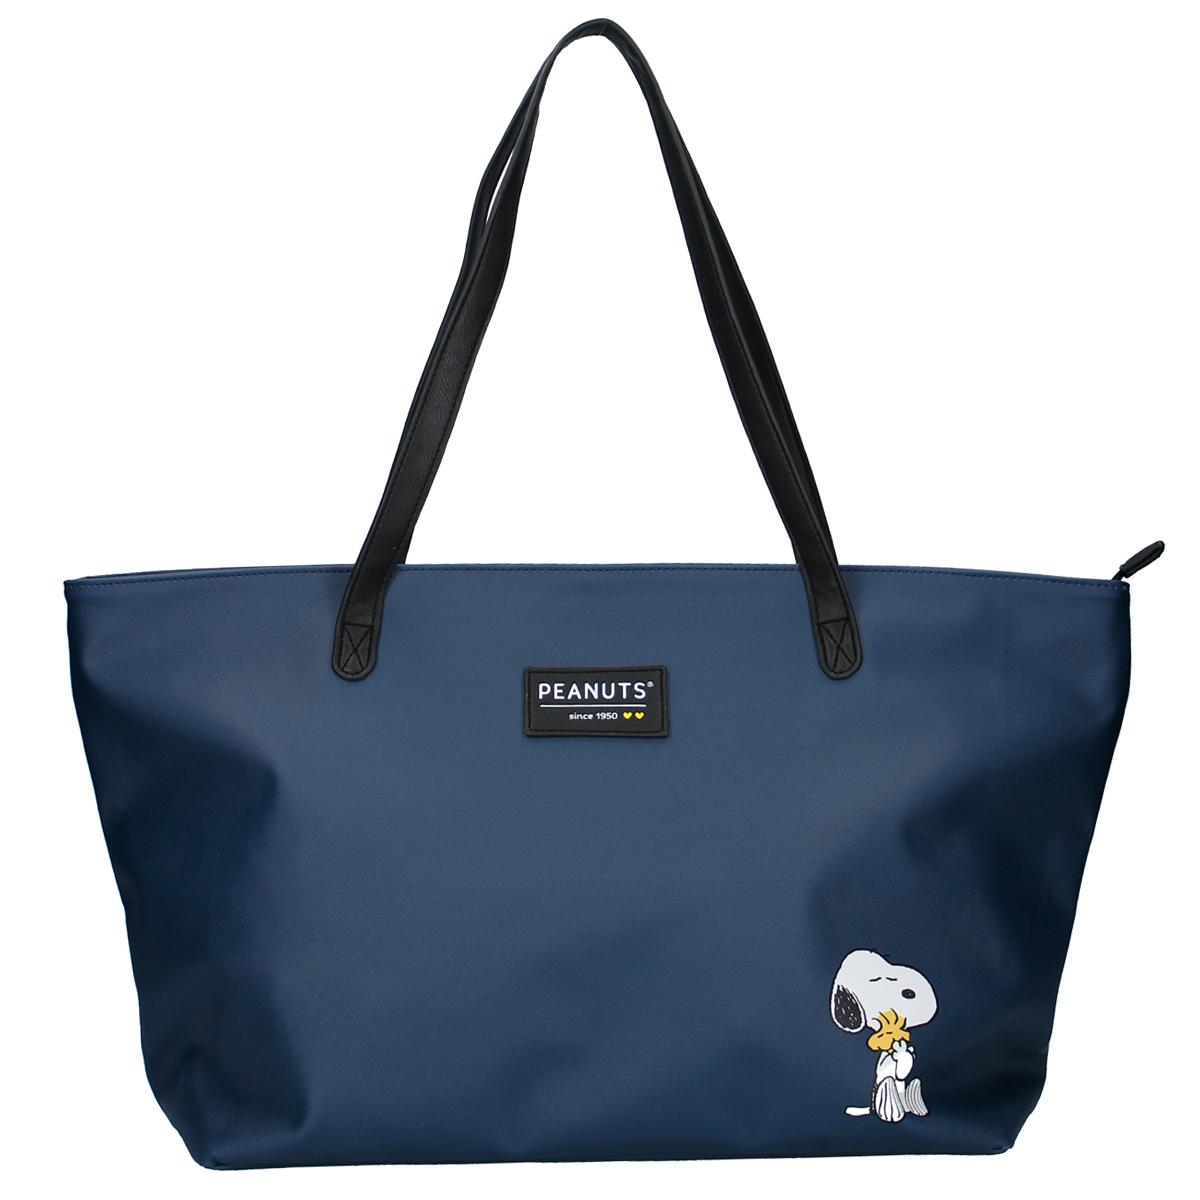 Sac shopping créateur \'Snoopy\' marine - 55x34x18 cm - [R0508]